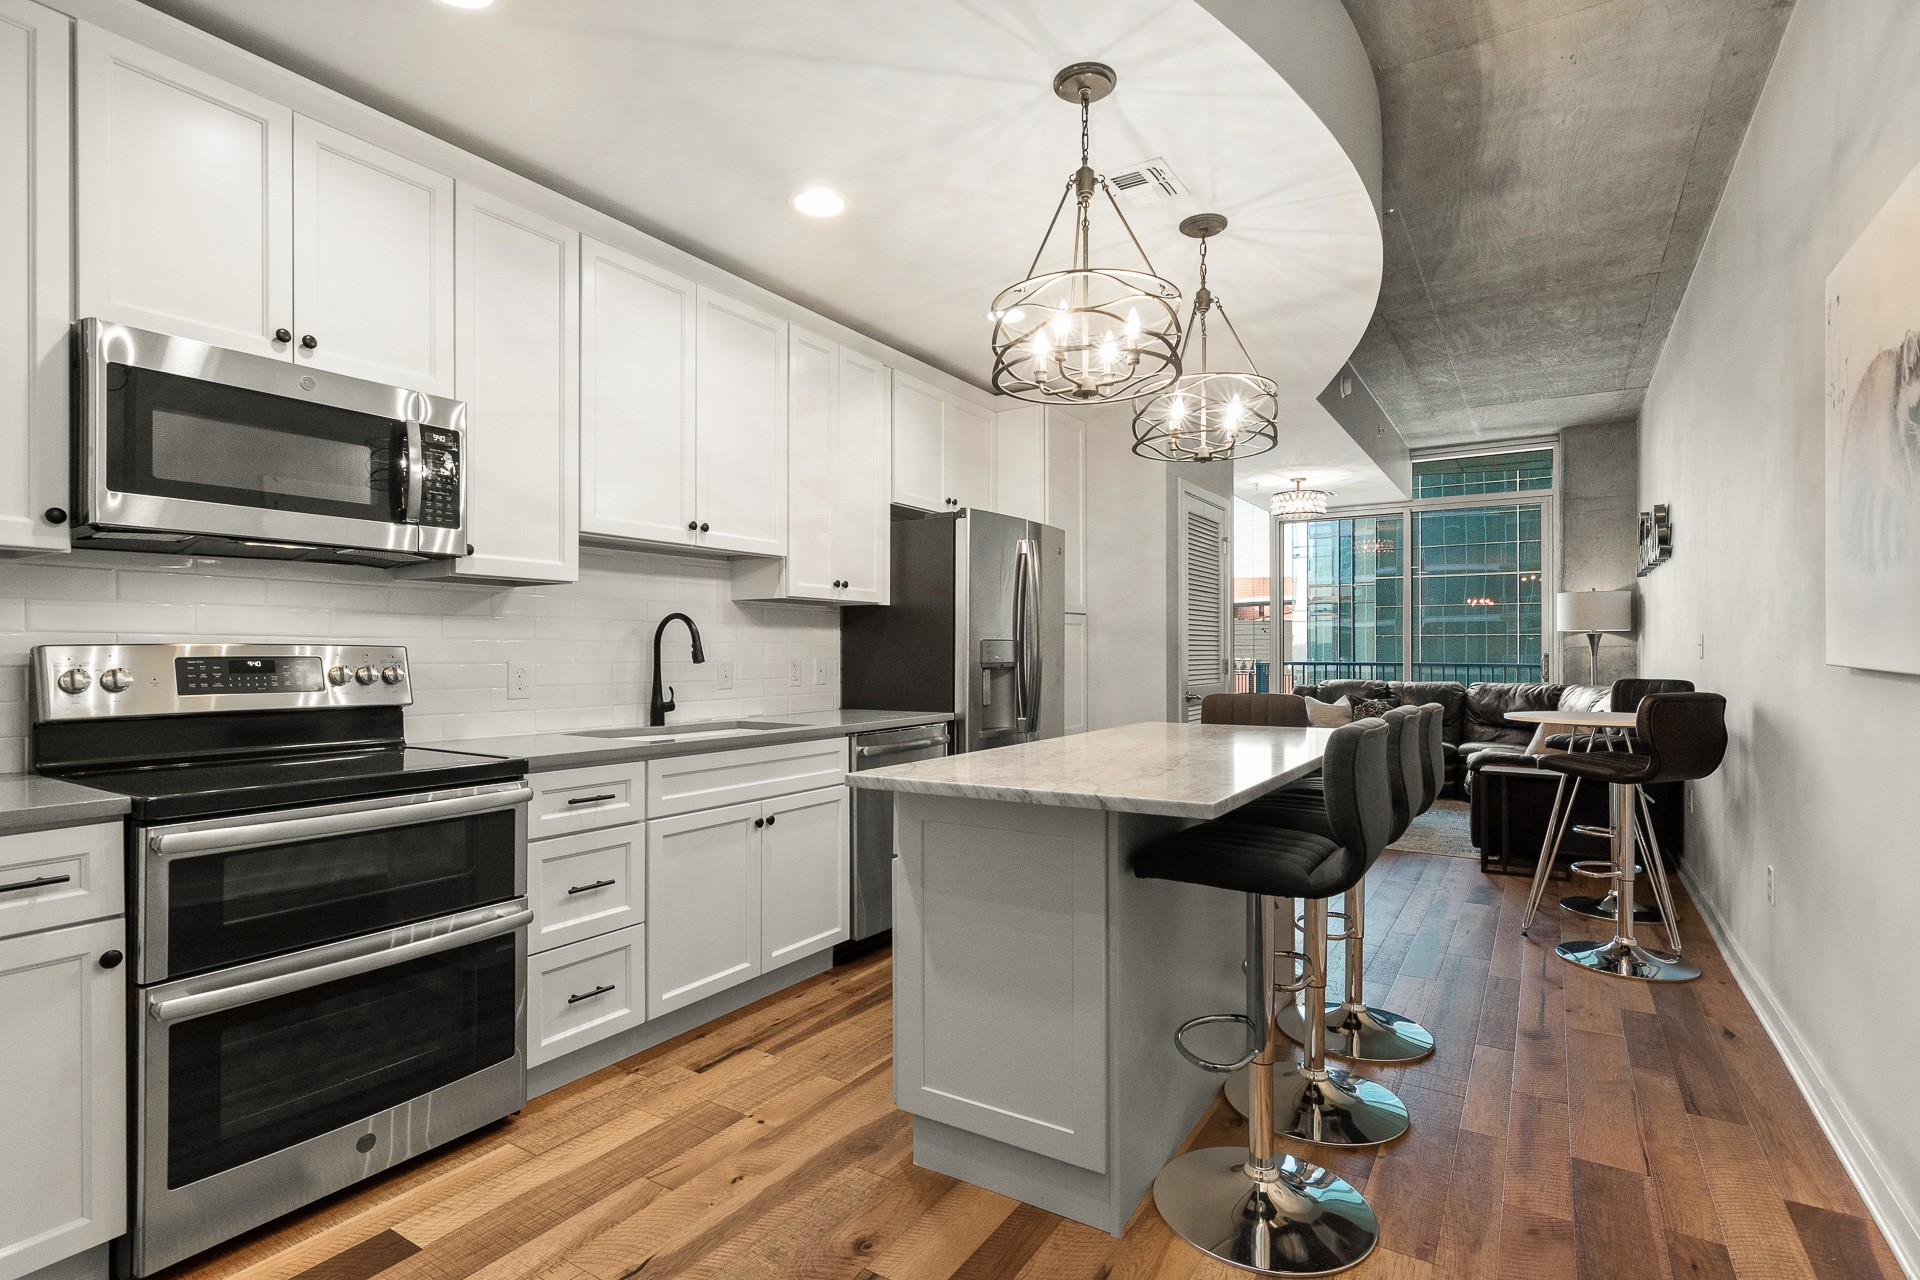 301 Demonbreun St #917 Property Photo - Nashville, TN real estate listing